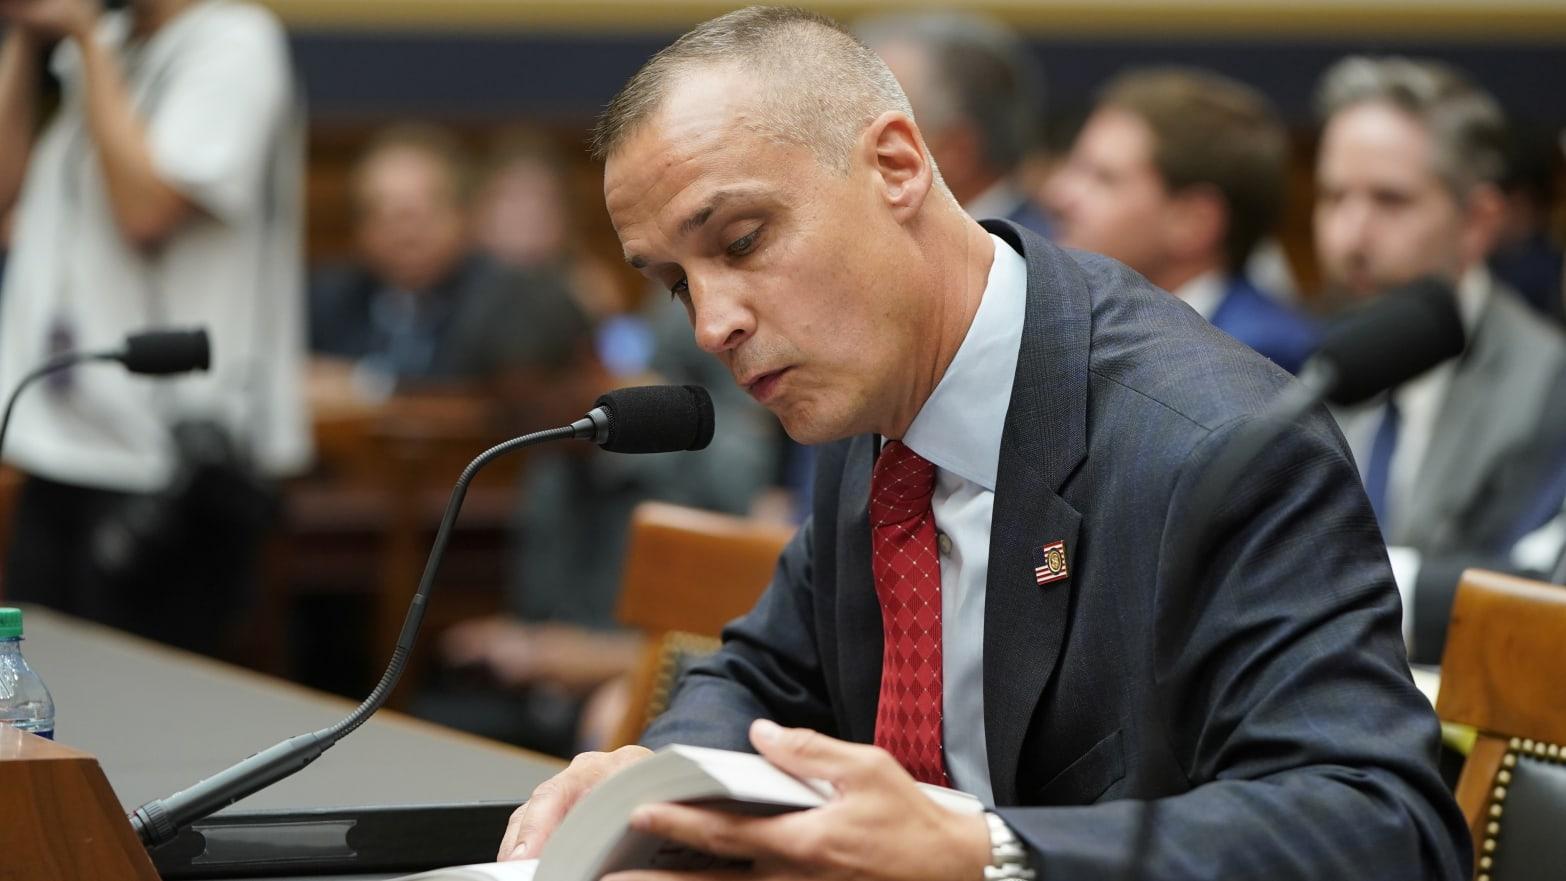 Corey Lewandowski's House Testimony Quickly Devolves Into a Total Mess